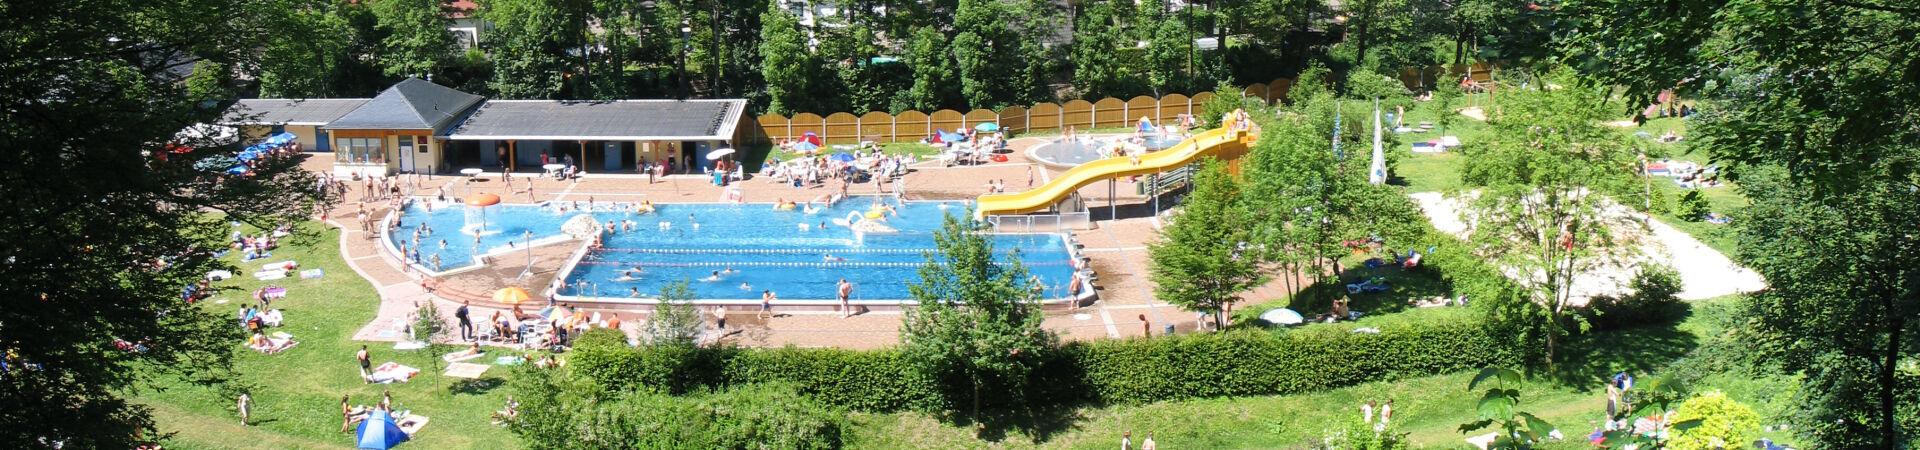 Freibad Alexandra